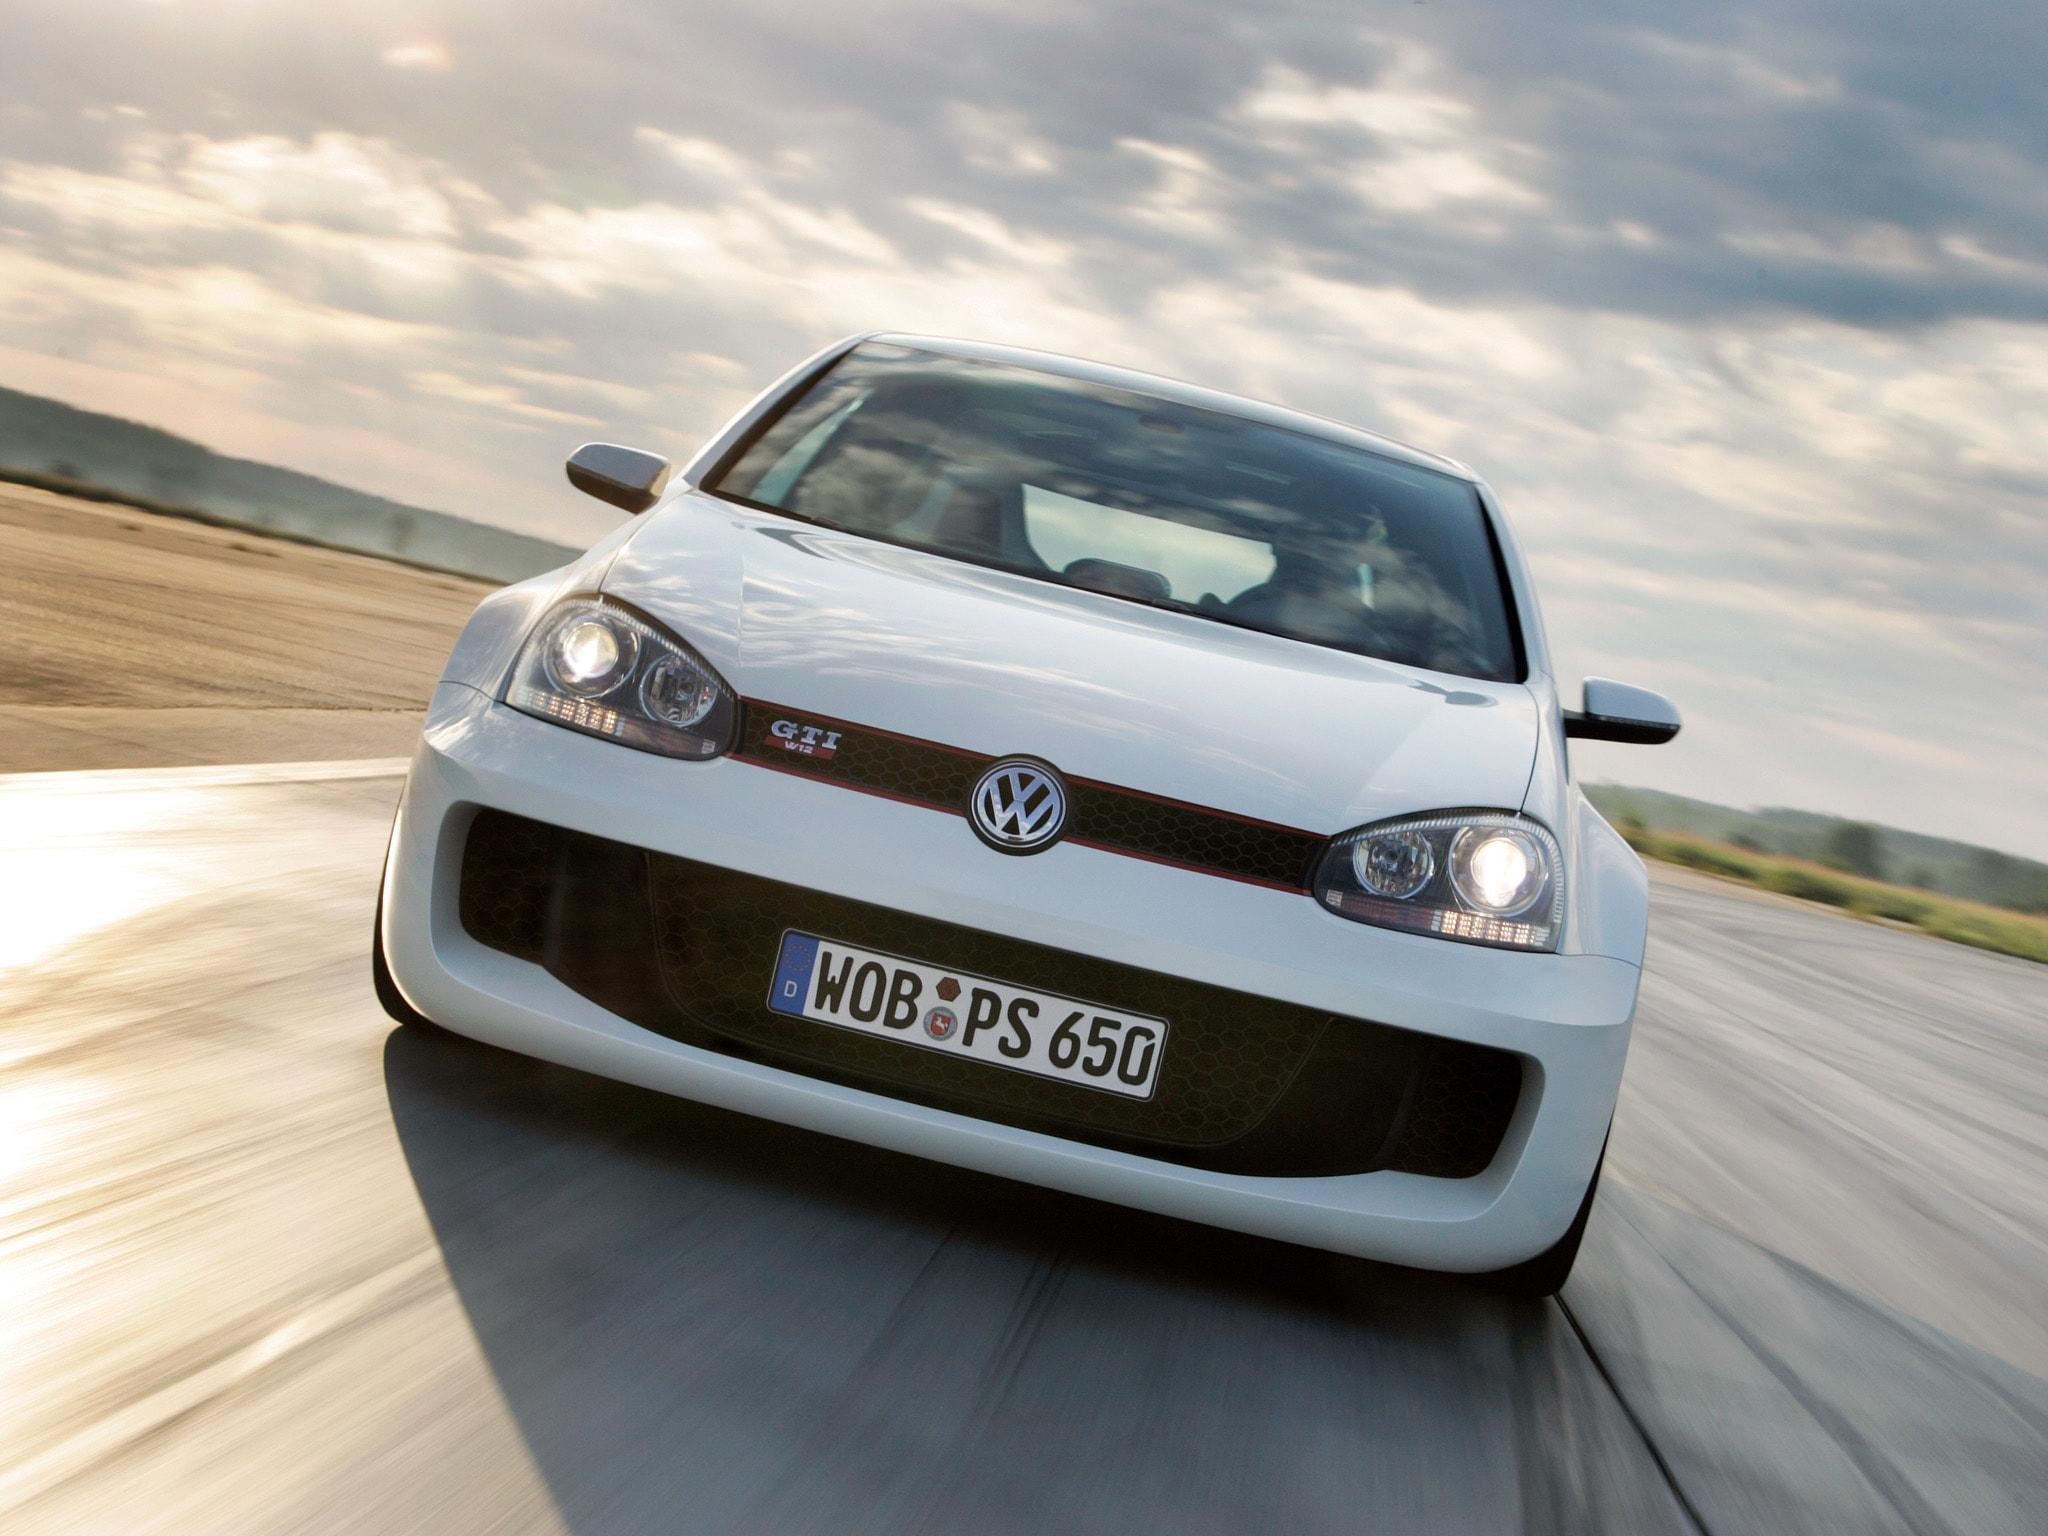 Volkswagen Golf GTI W12-650 Concept Full hd wallpapers